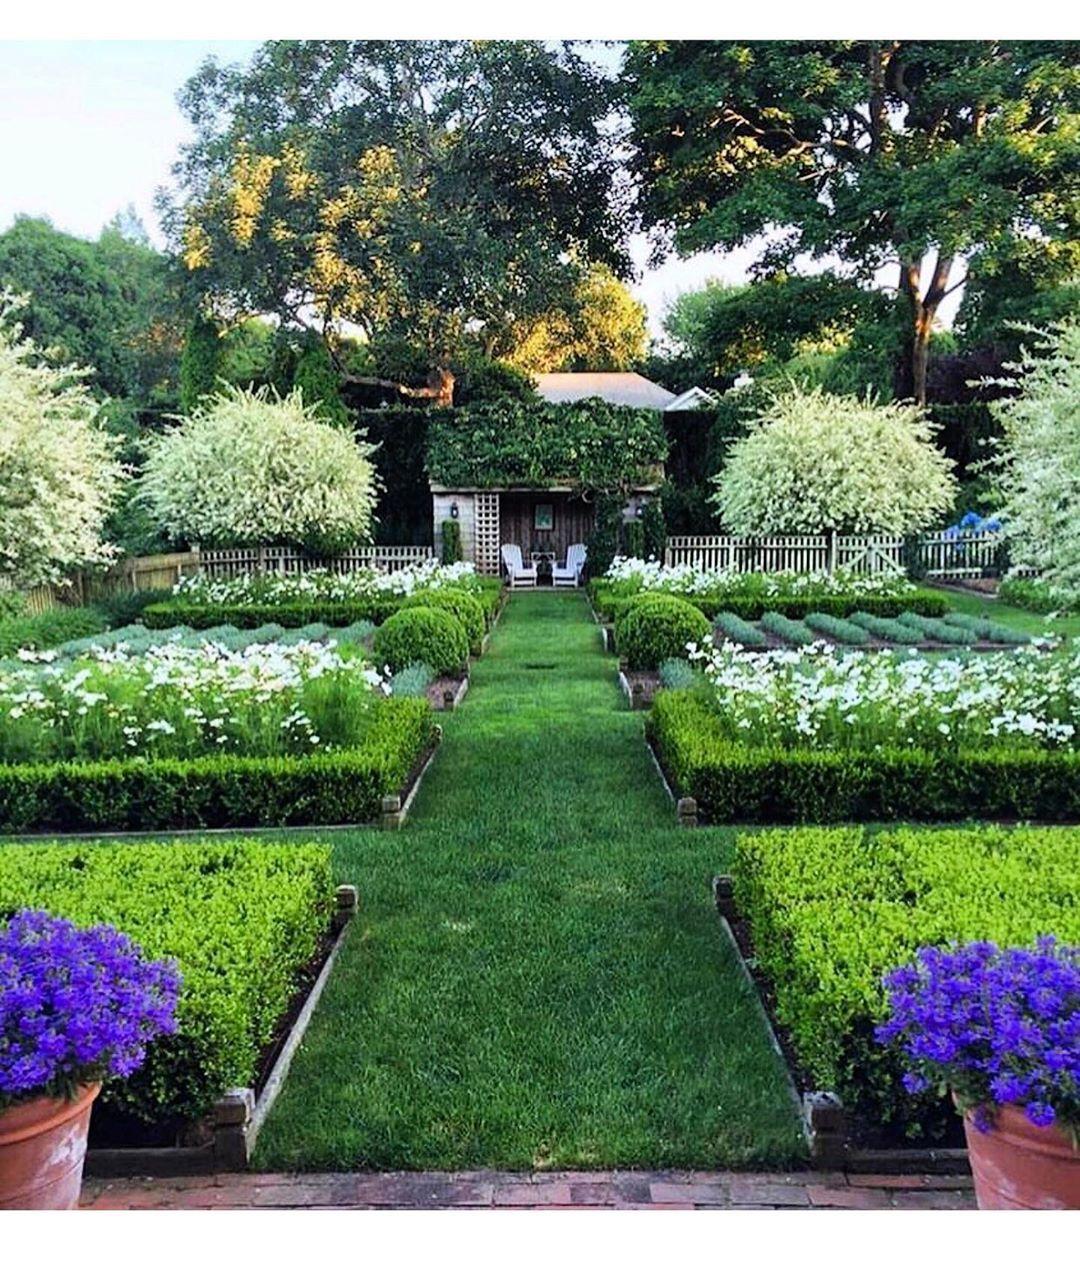 Ina Garten Garden Lush And Beautiful In The East Hamptons Via Tom Samet On Insta In 2020 Ideal Gardens English Garden Design Ina Garden